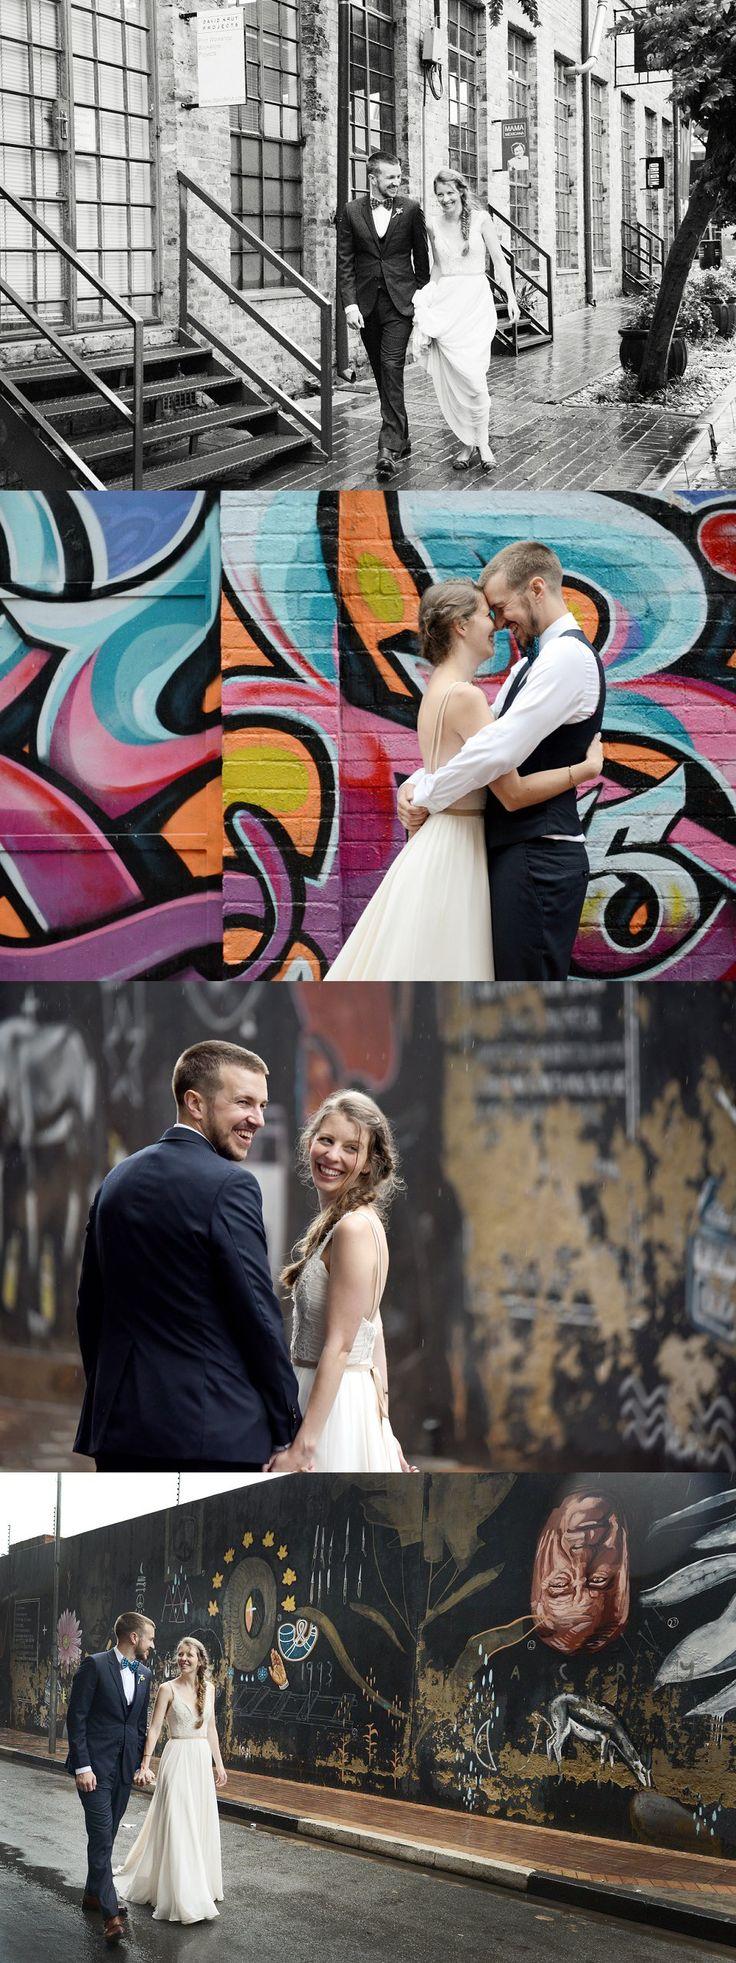 Jason & Nicole's Joburg city wedding. | Runaway Romance| Full of Maboneng street art, roof top views, Hand made decor & pops of Shweshwe.